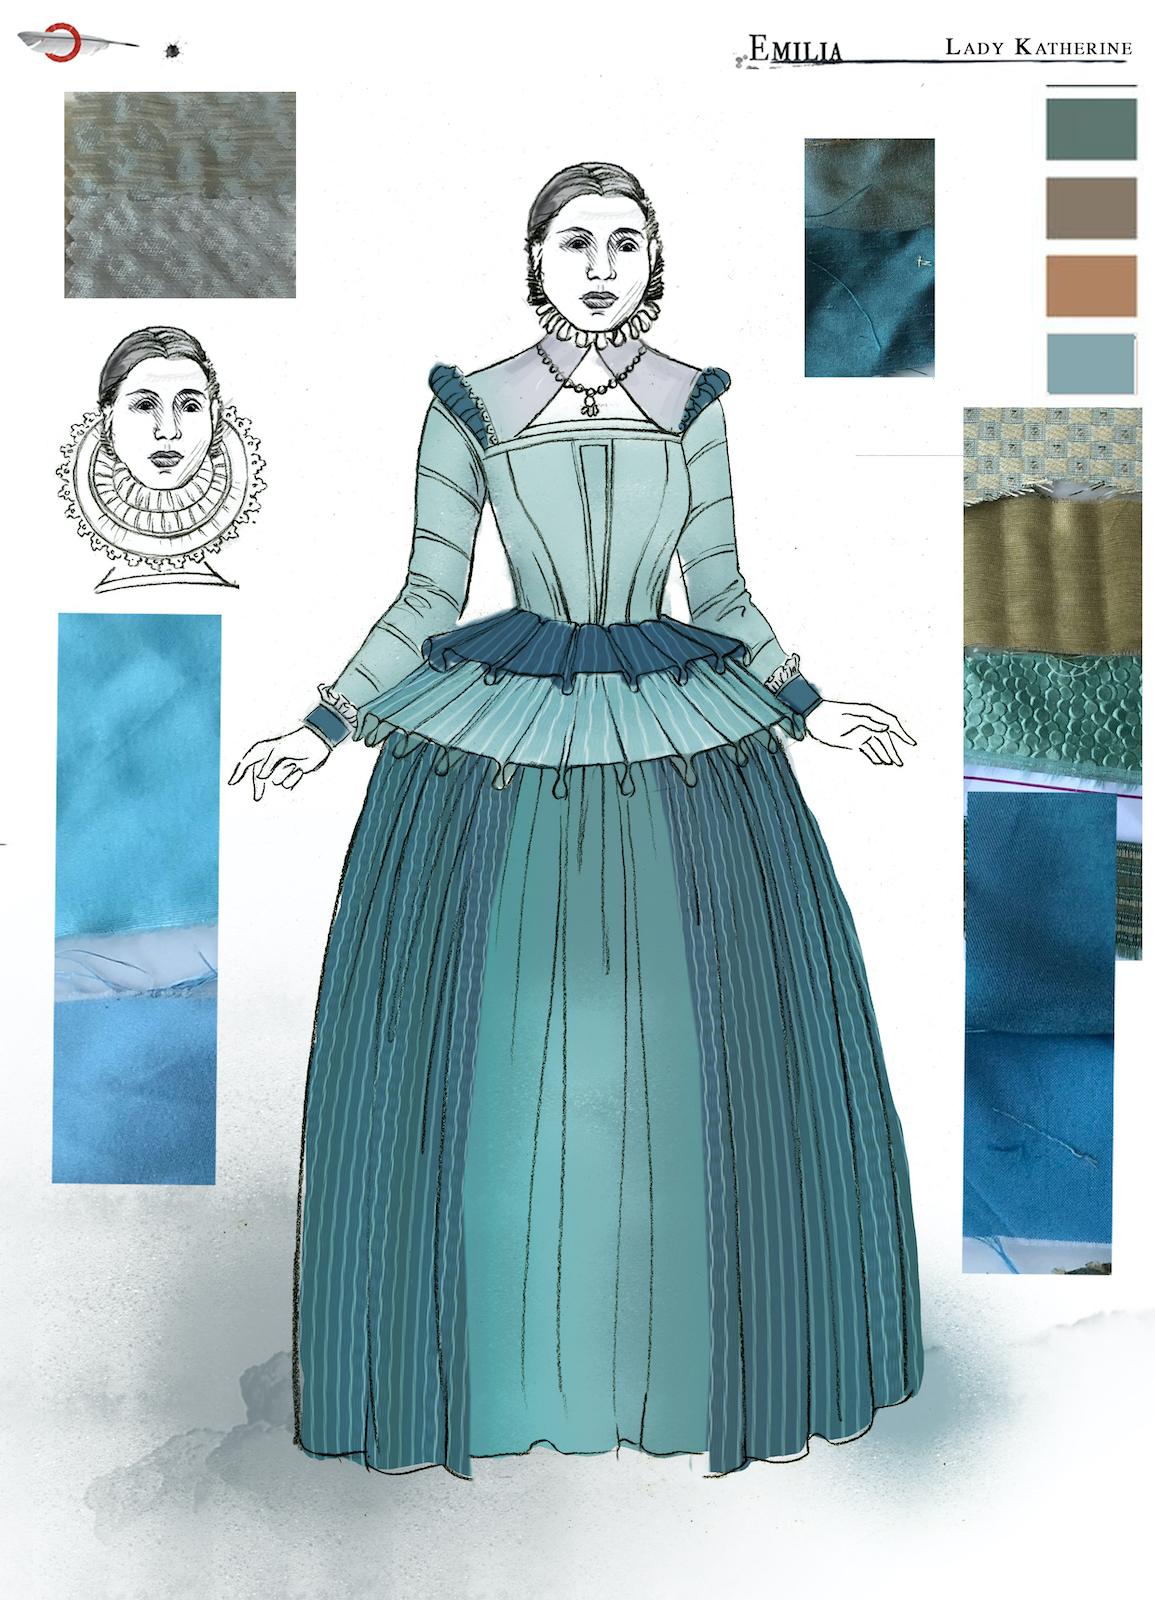 A costume sketch of a green Elizabethan dress